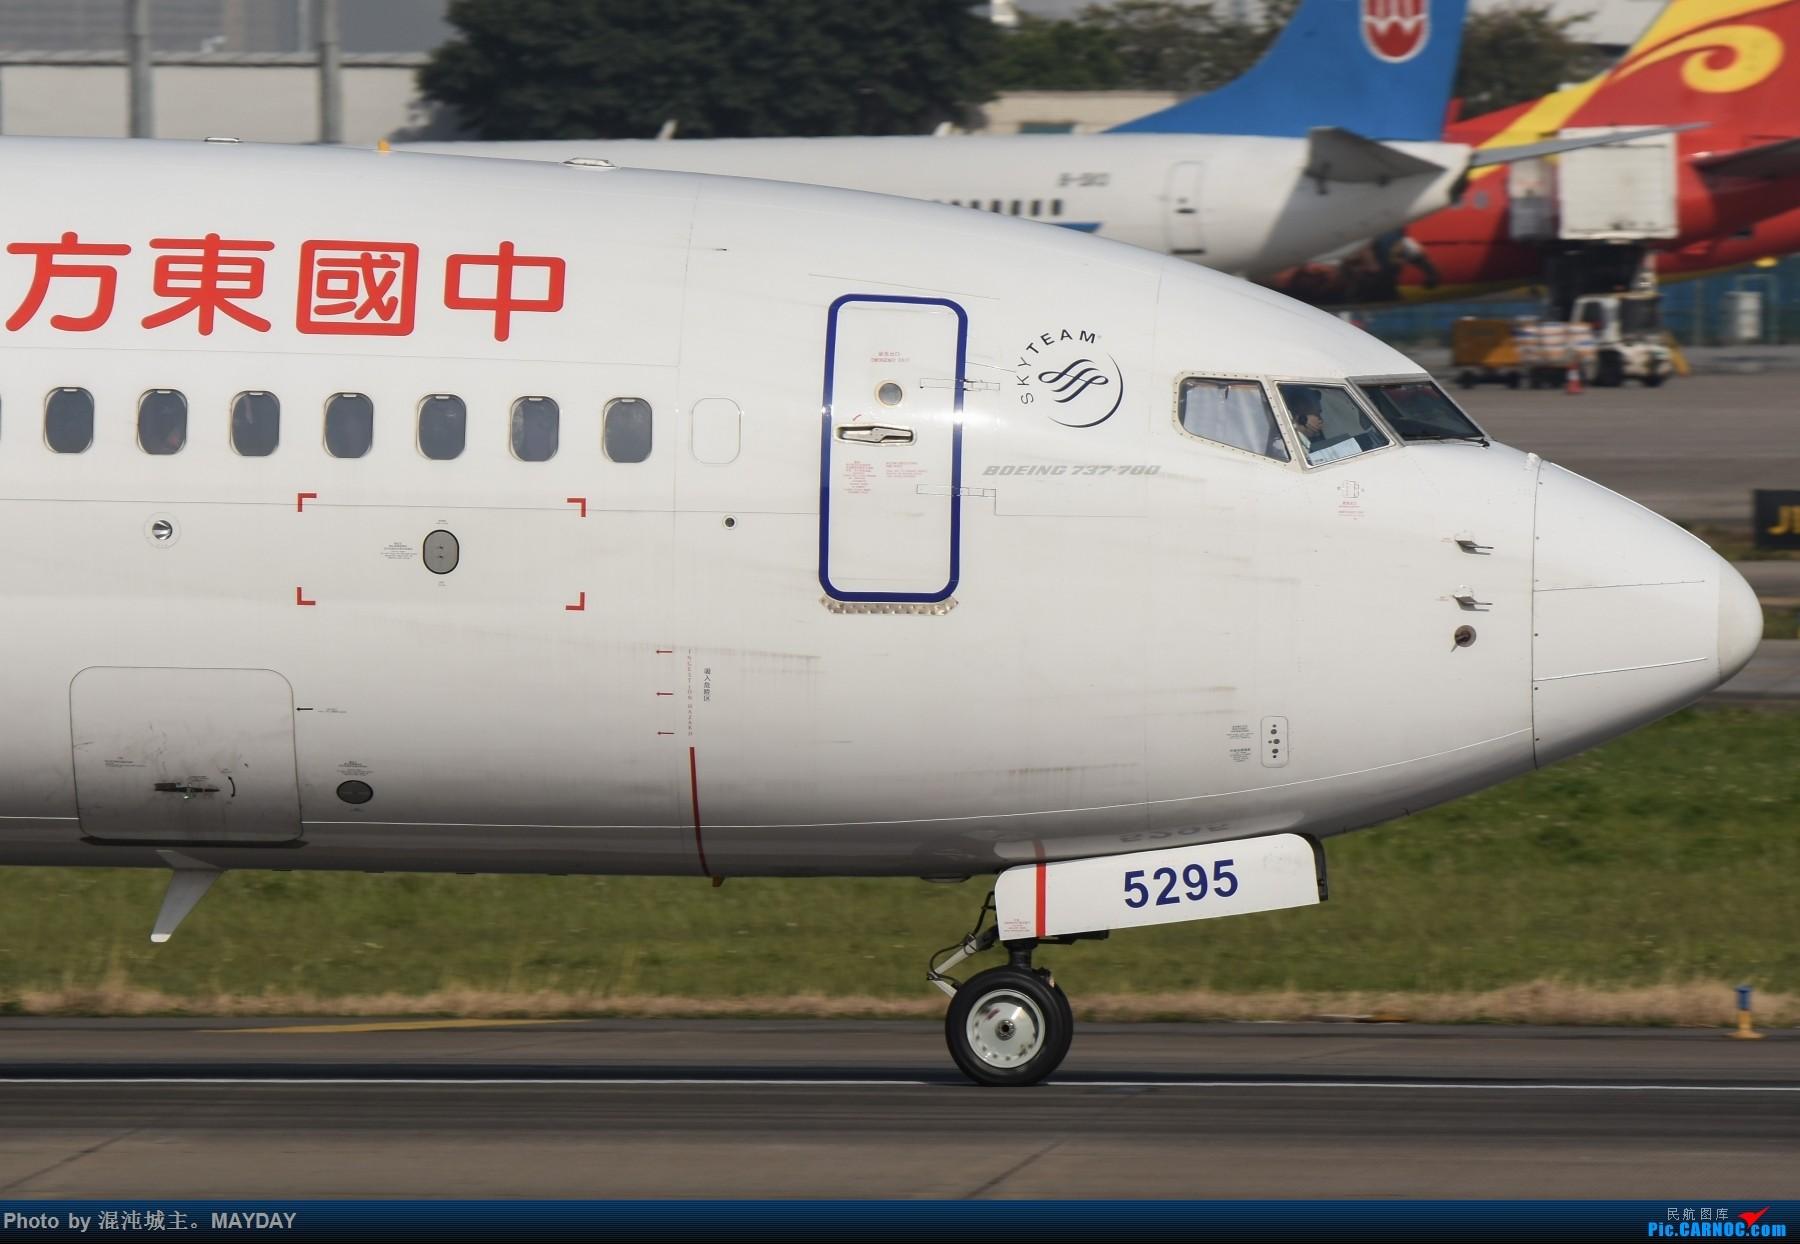 Re:[原创]试镜..细节. BOEING 737-700 B-5295 中国广州白云国际机场